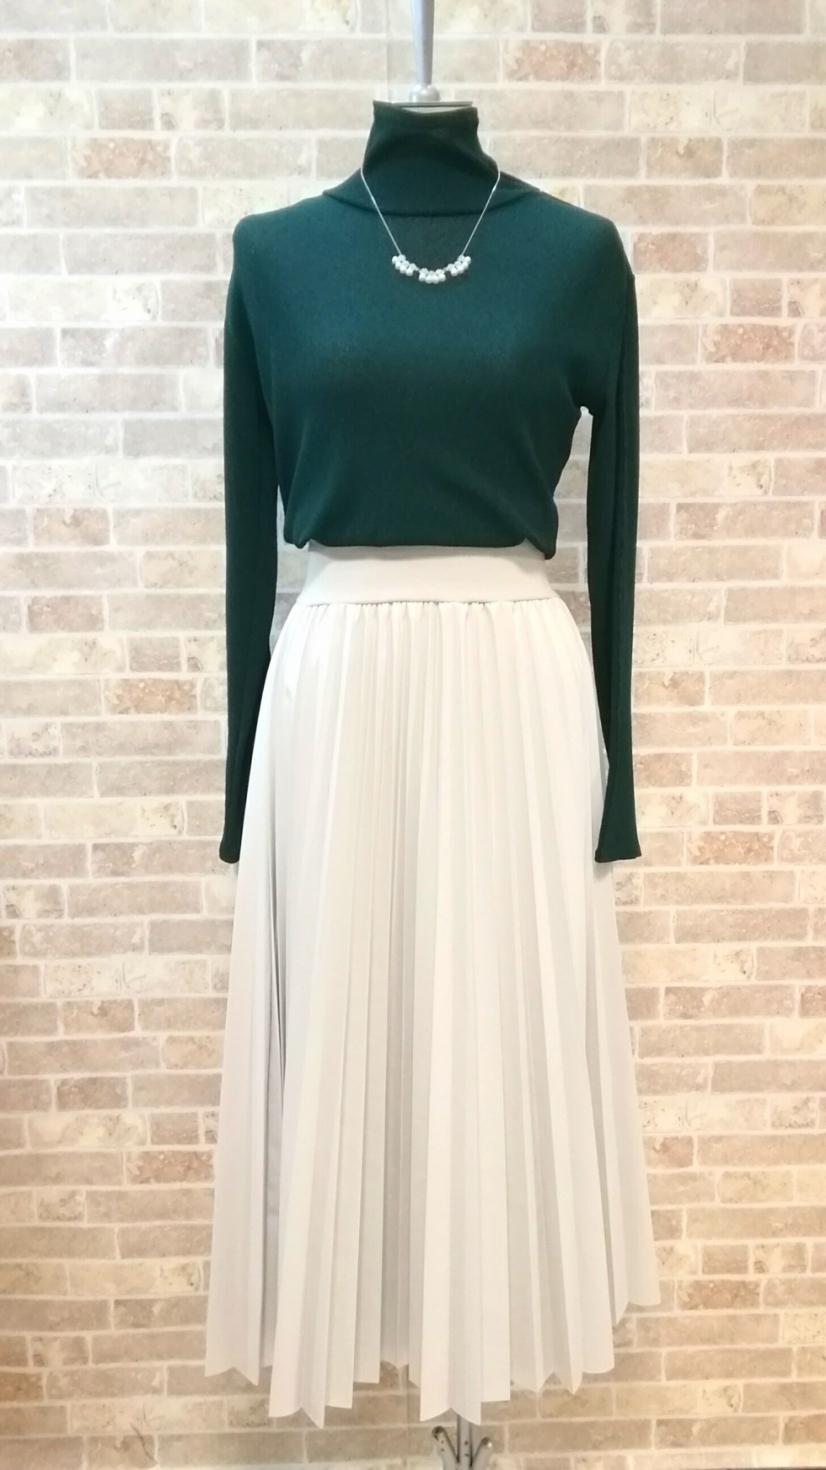 stola.×MONIL.より、②人気のデザイン=スカートが入荷しました♡